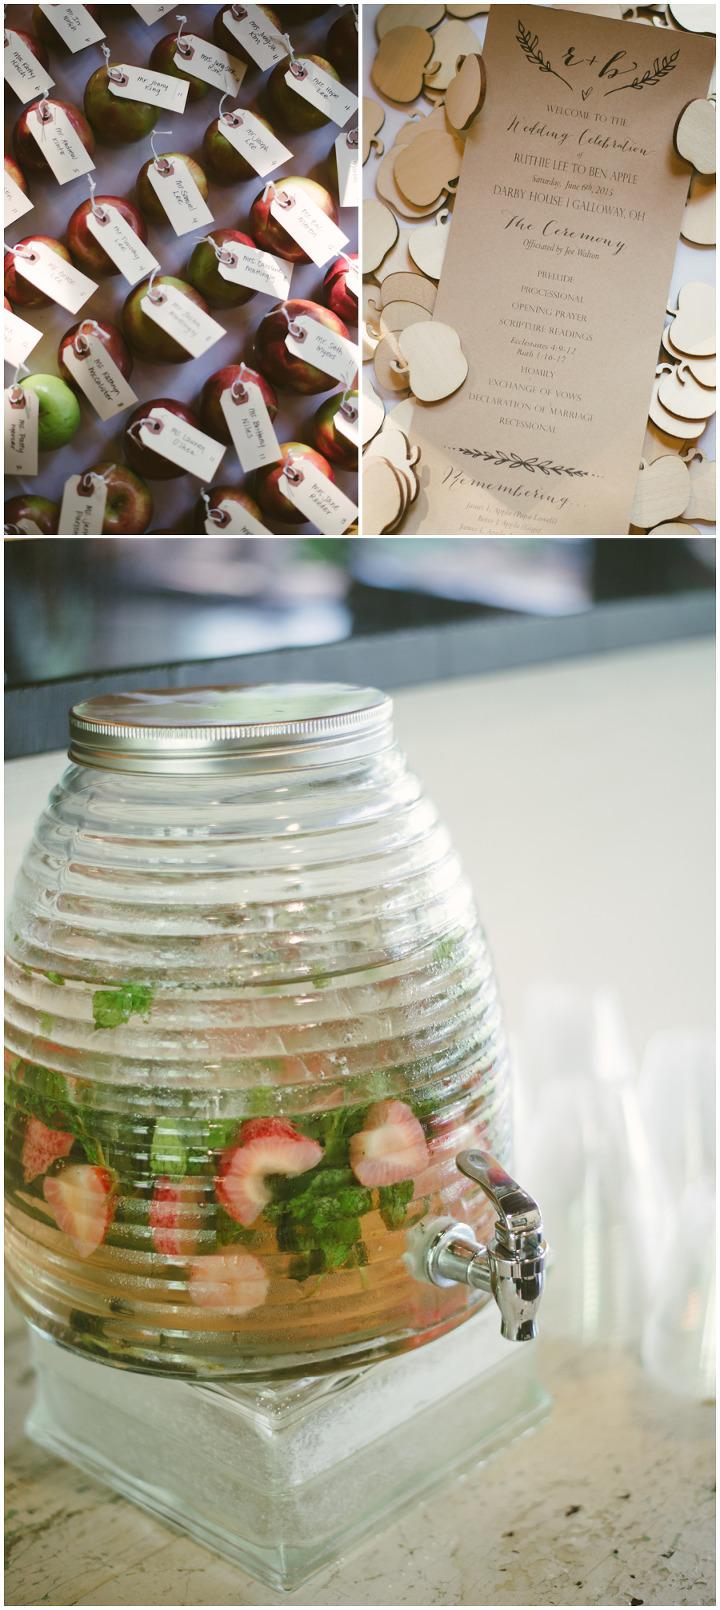 Blog Collage-Ruthie12